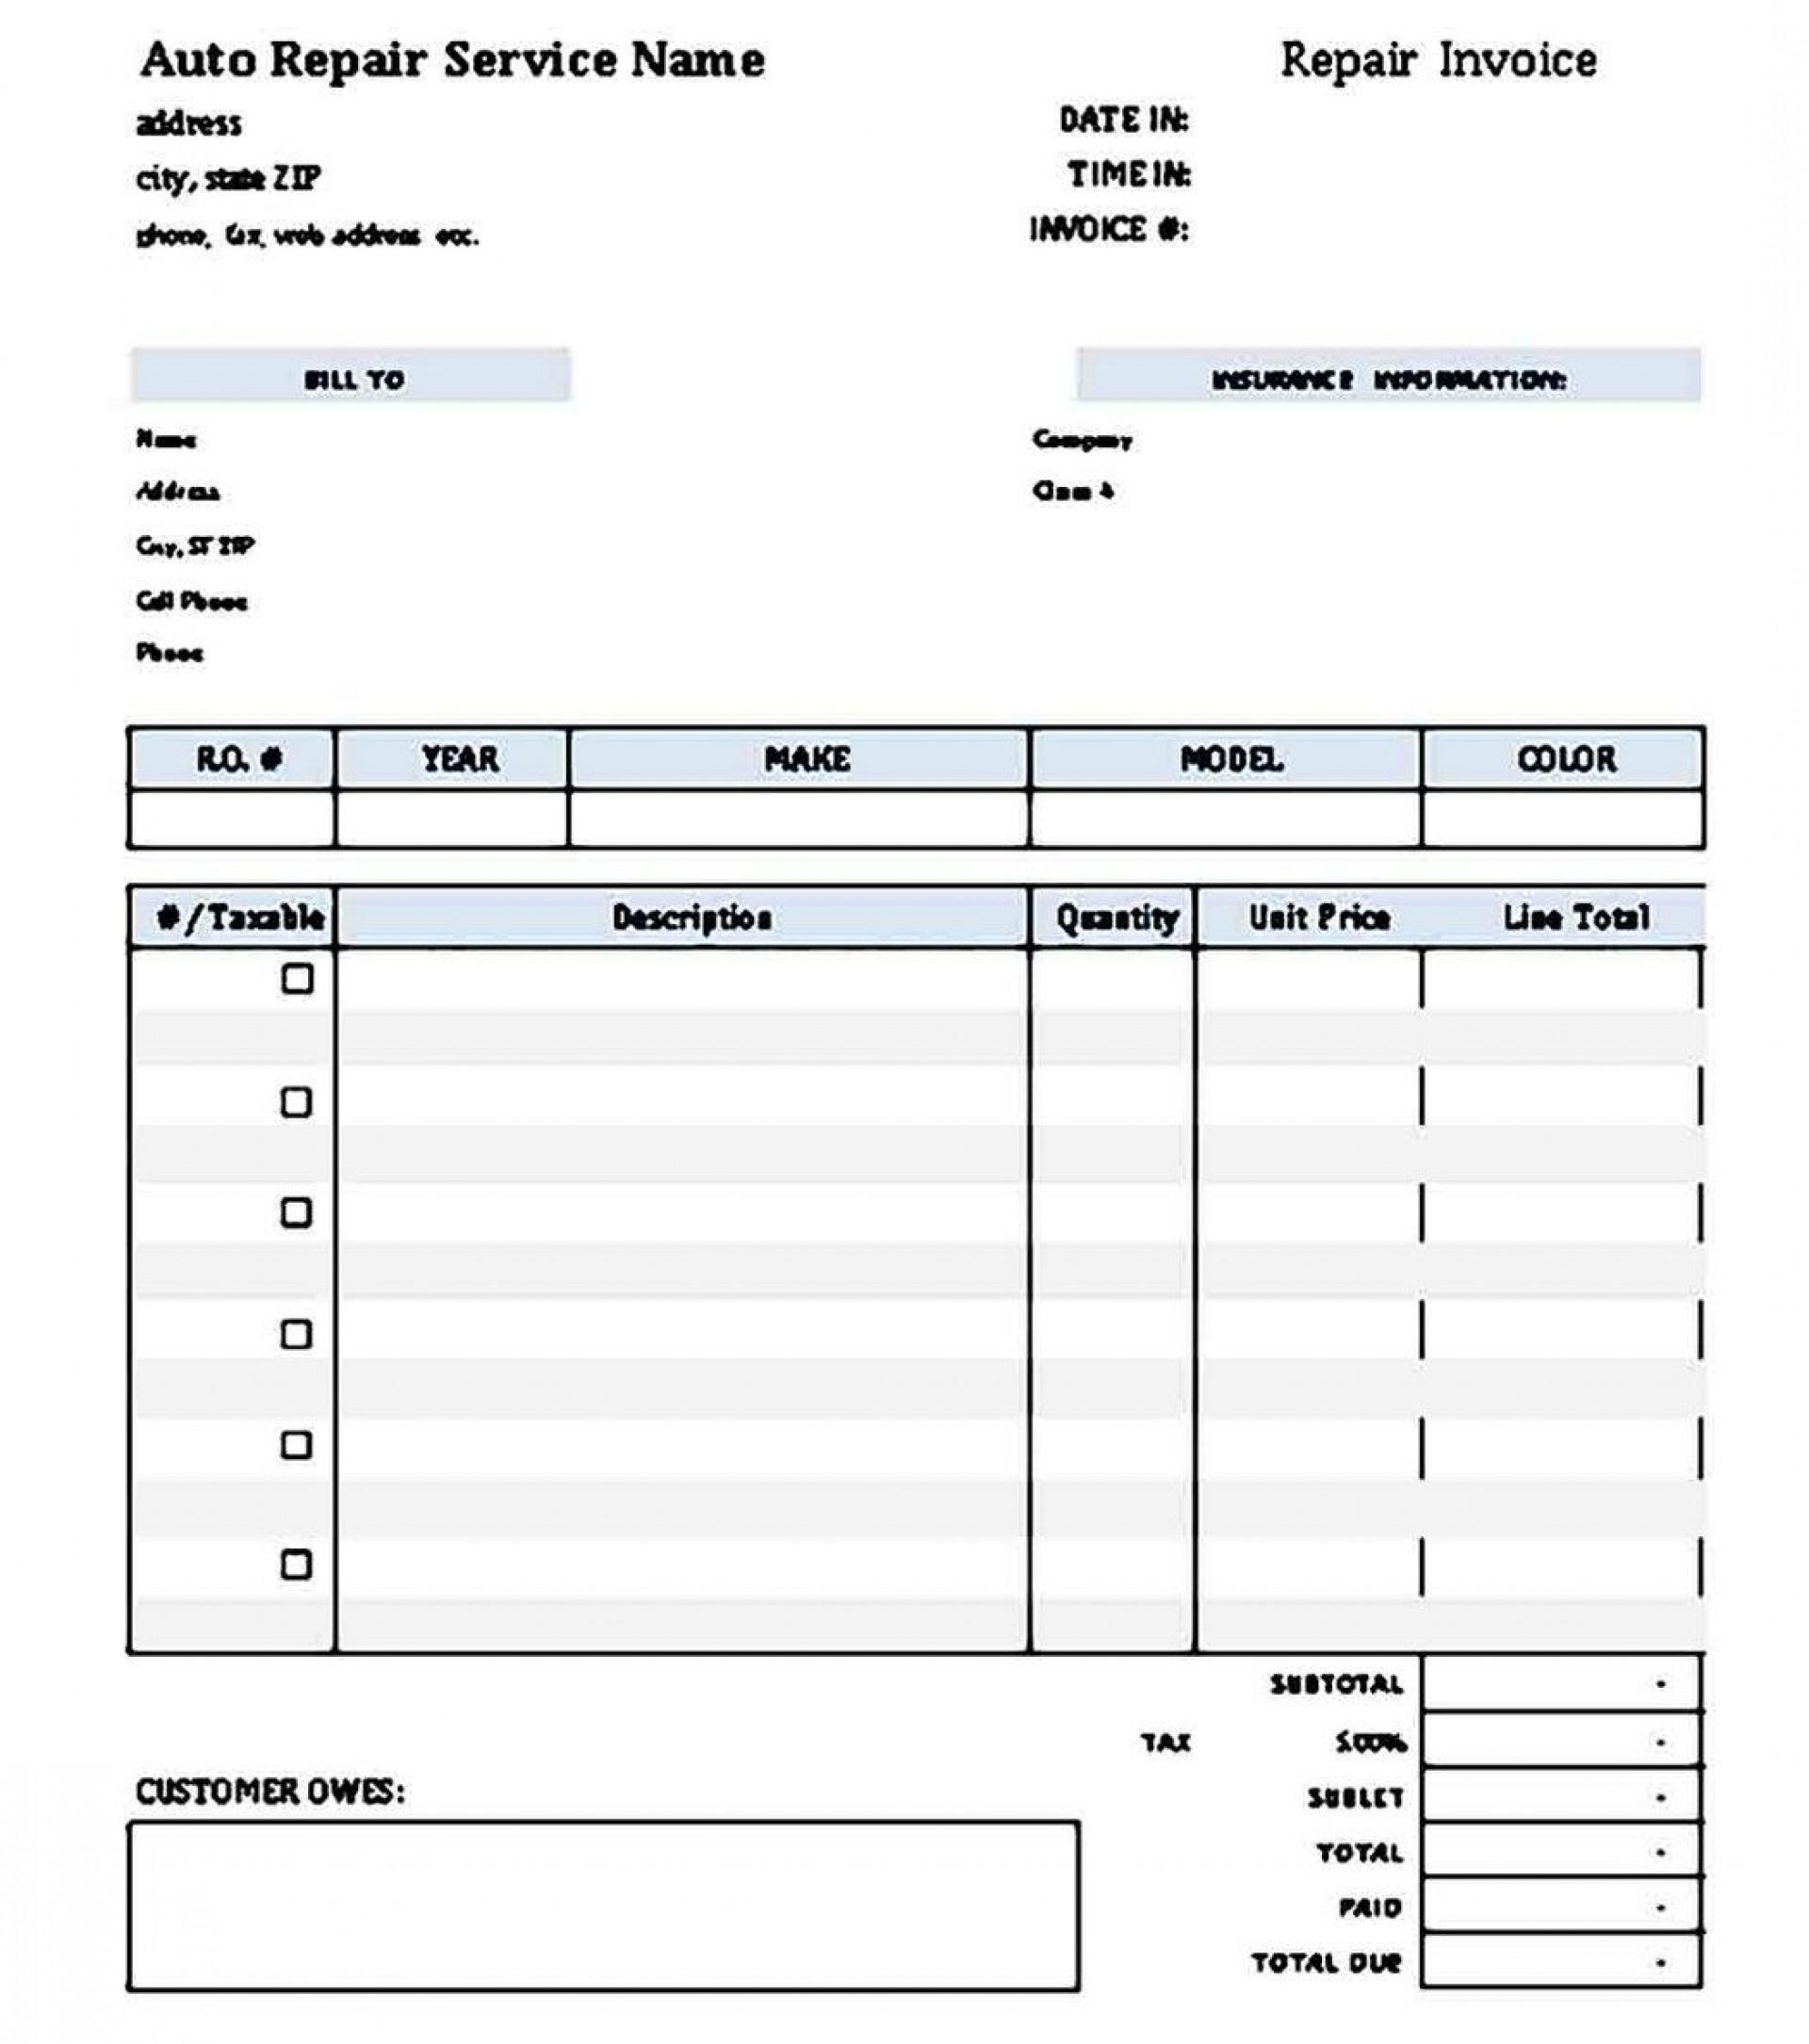 007 Phenomenal Auto Repair Order Template High Resolution  Work Free Automotive Car1920